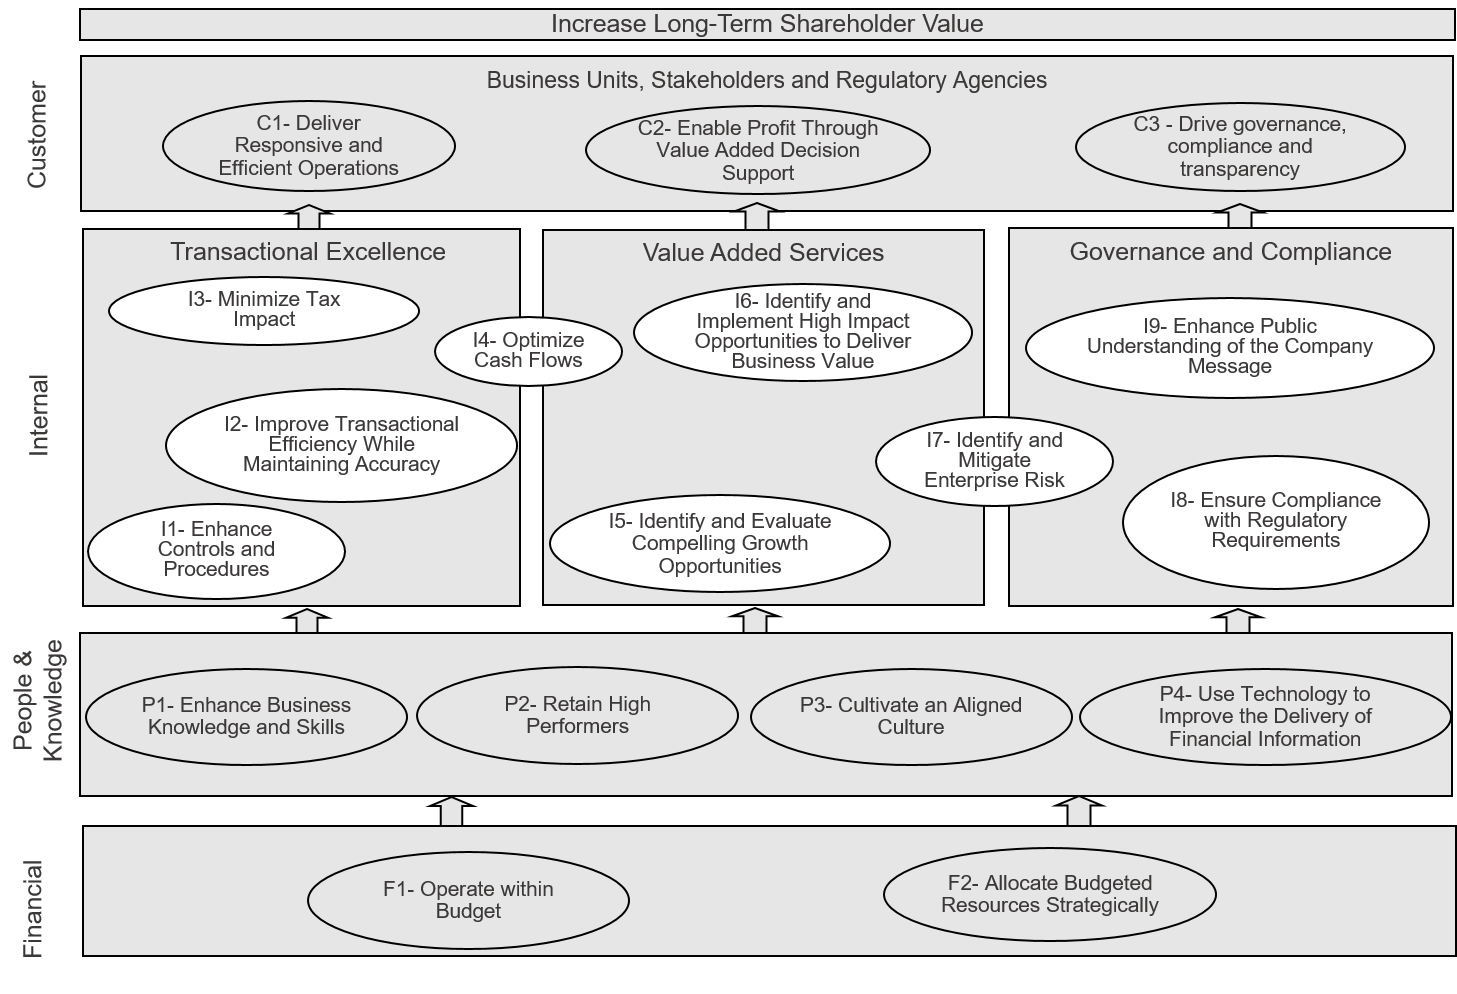 financeorganizationstratmap.png